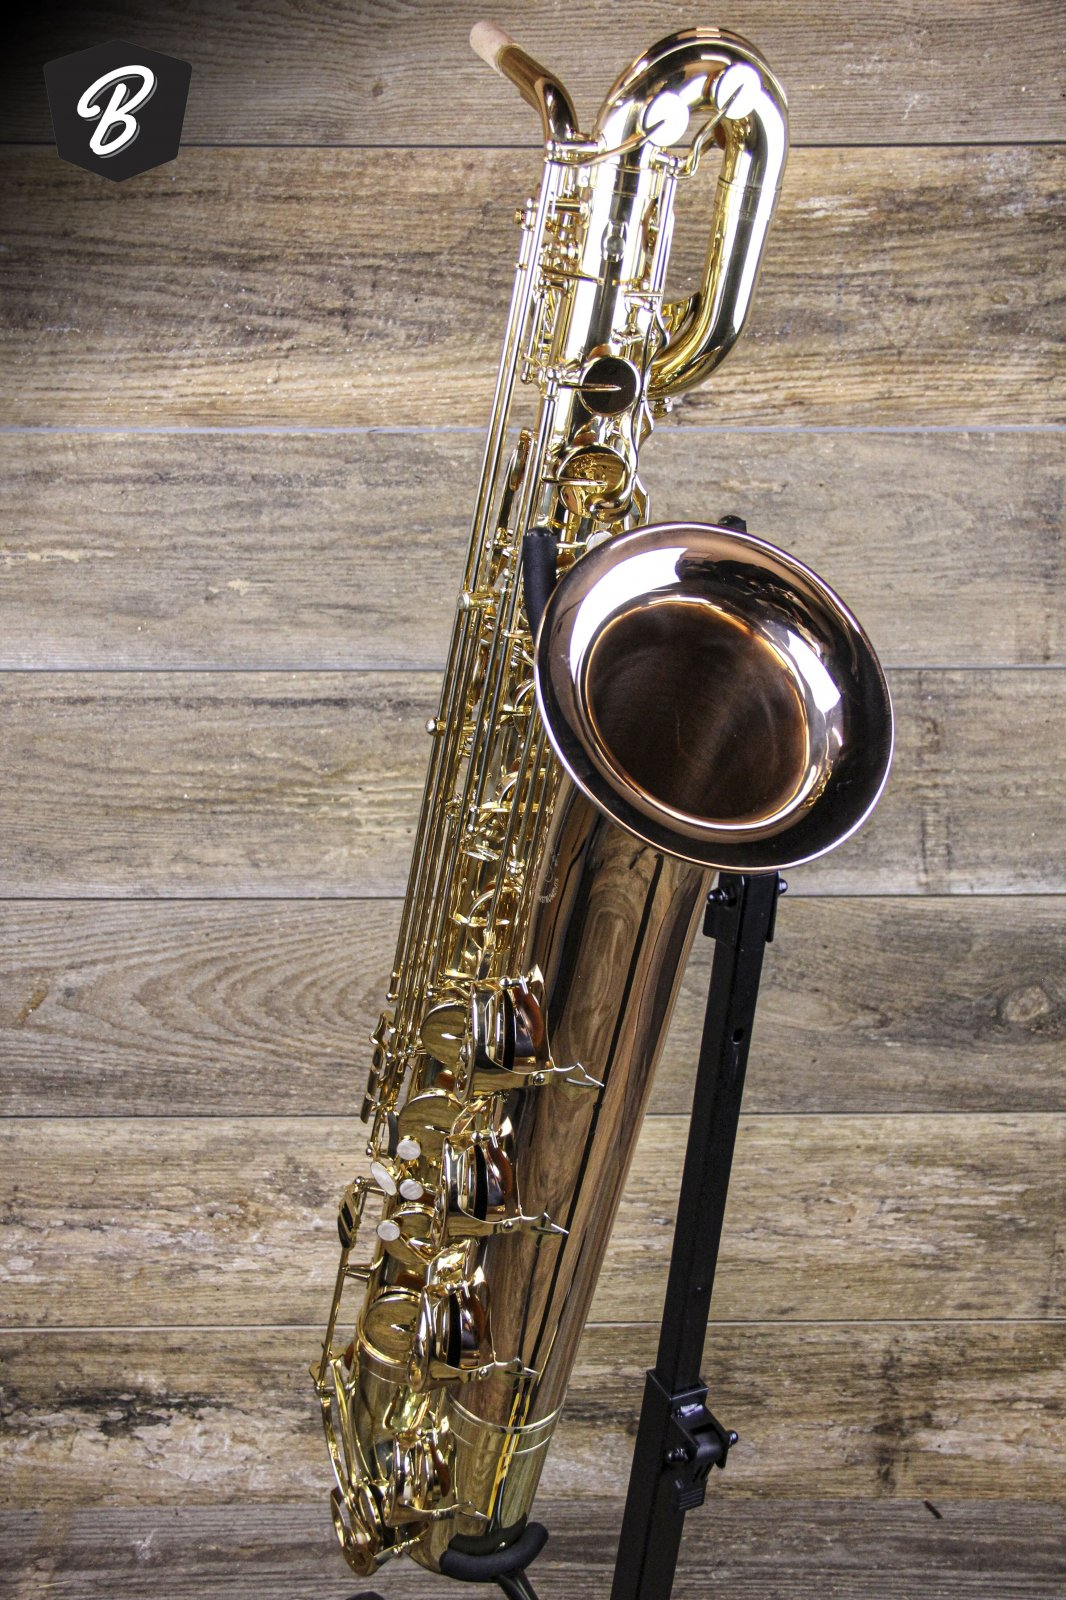 JP044 Bari Saxophone W/Roller Case